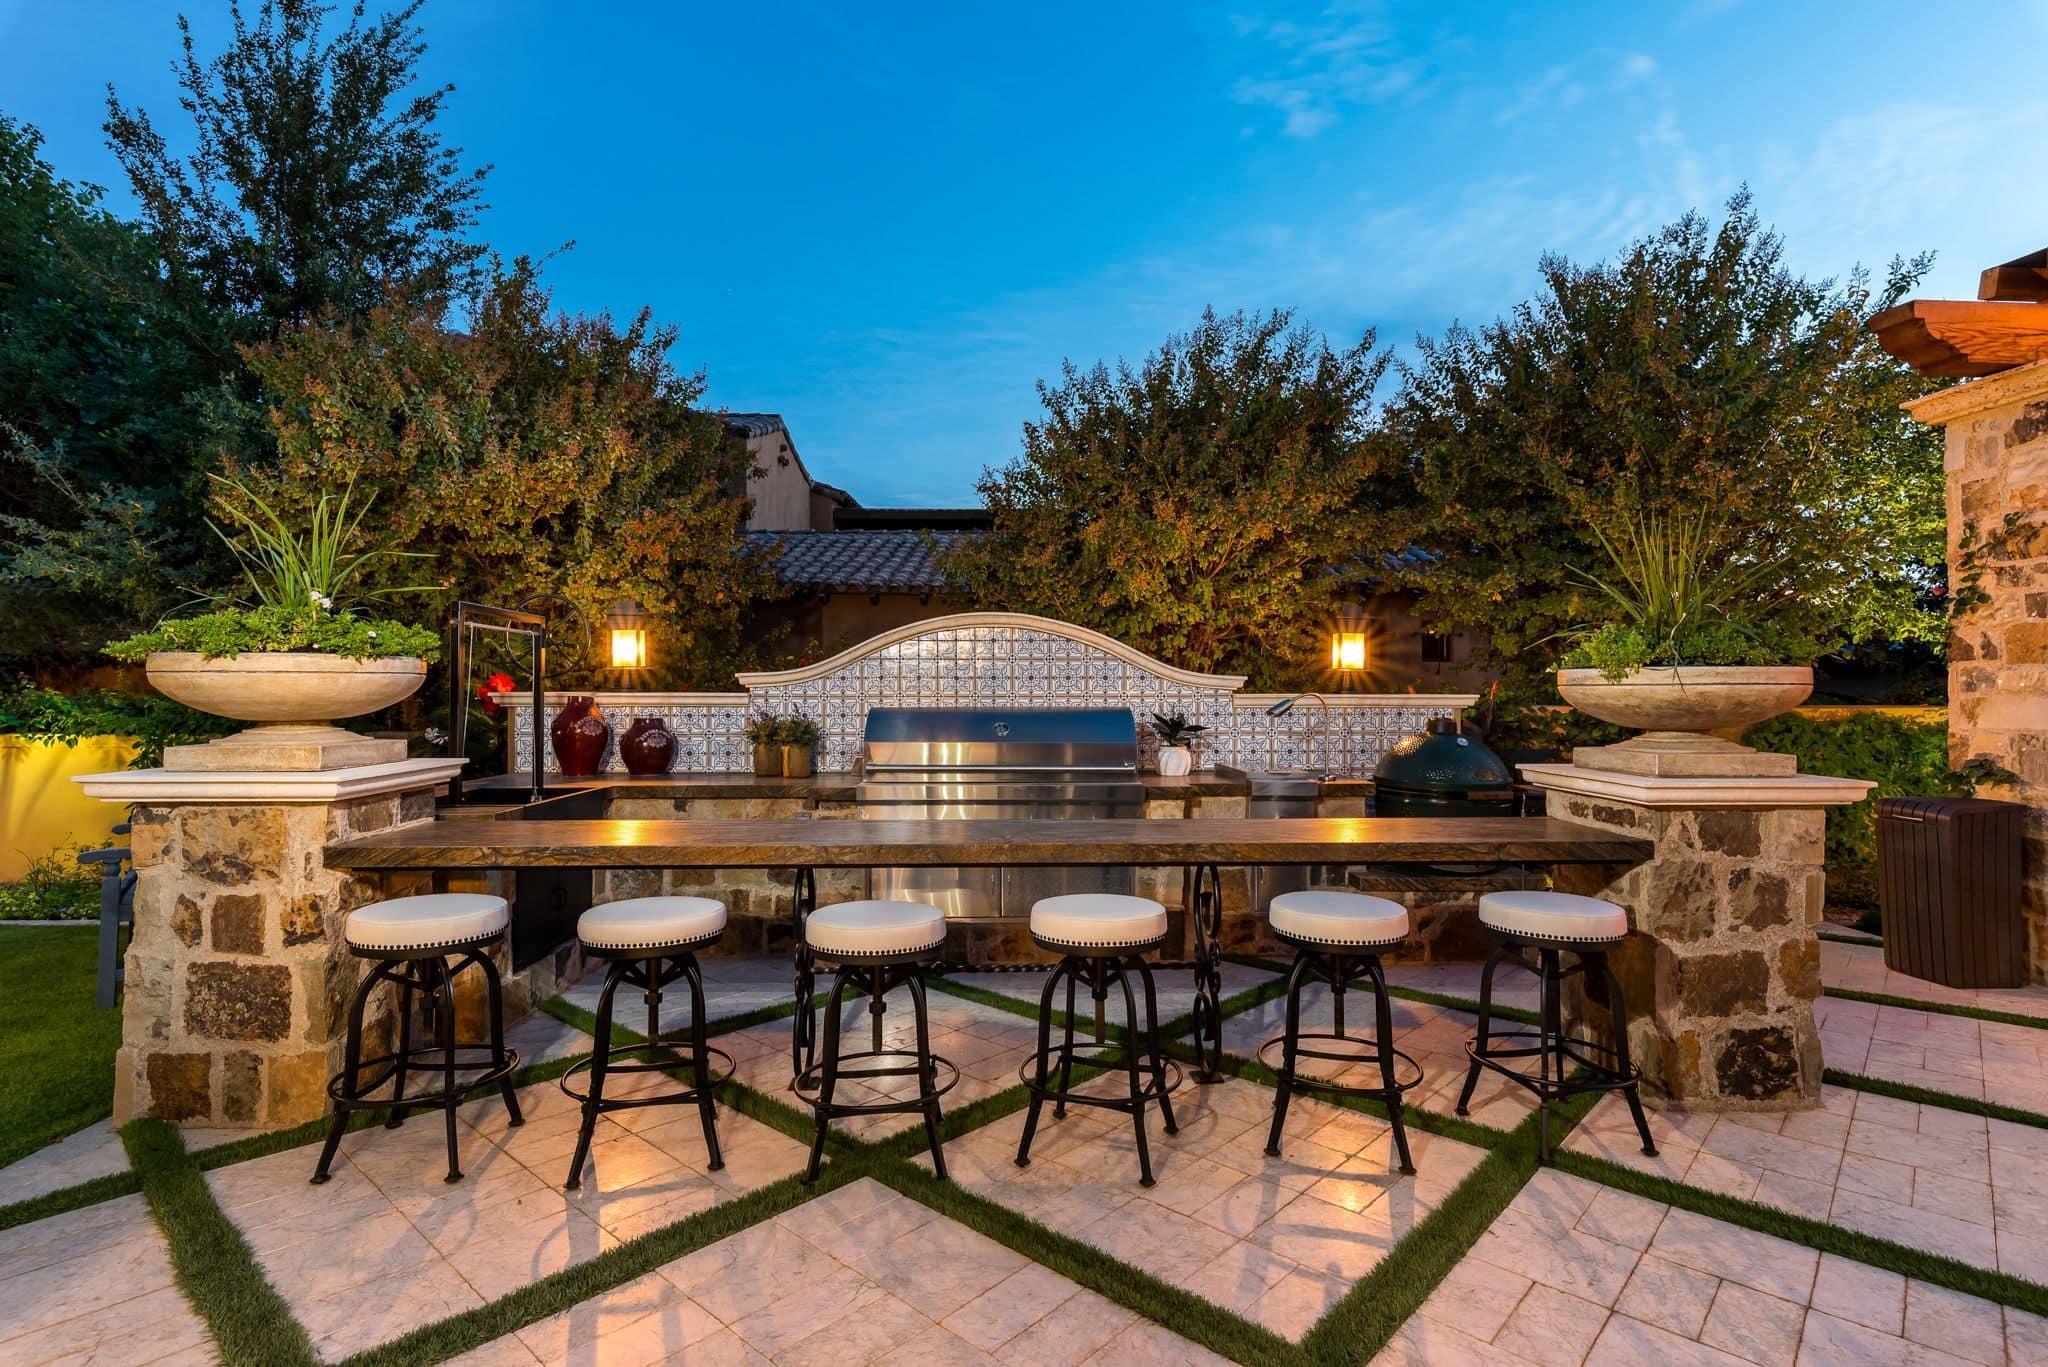 Luxury Outdoor Living Space Design Ideas - Fratantoni Design on Fancy Outdoor Living id=38783